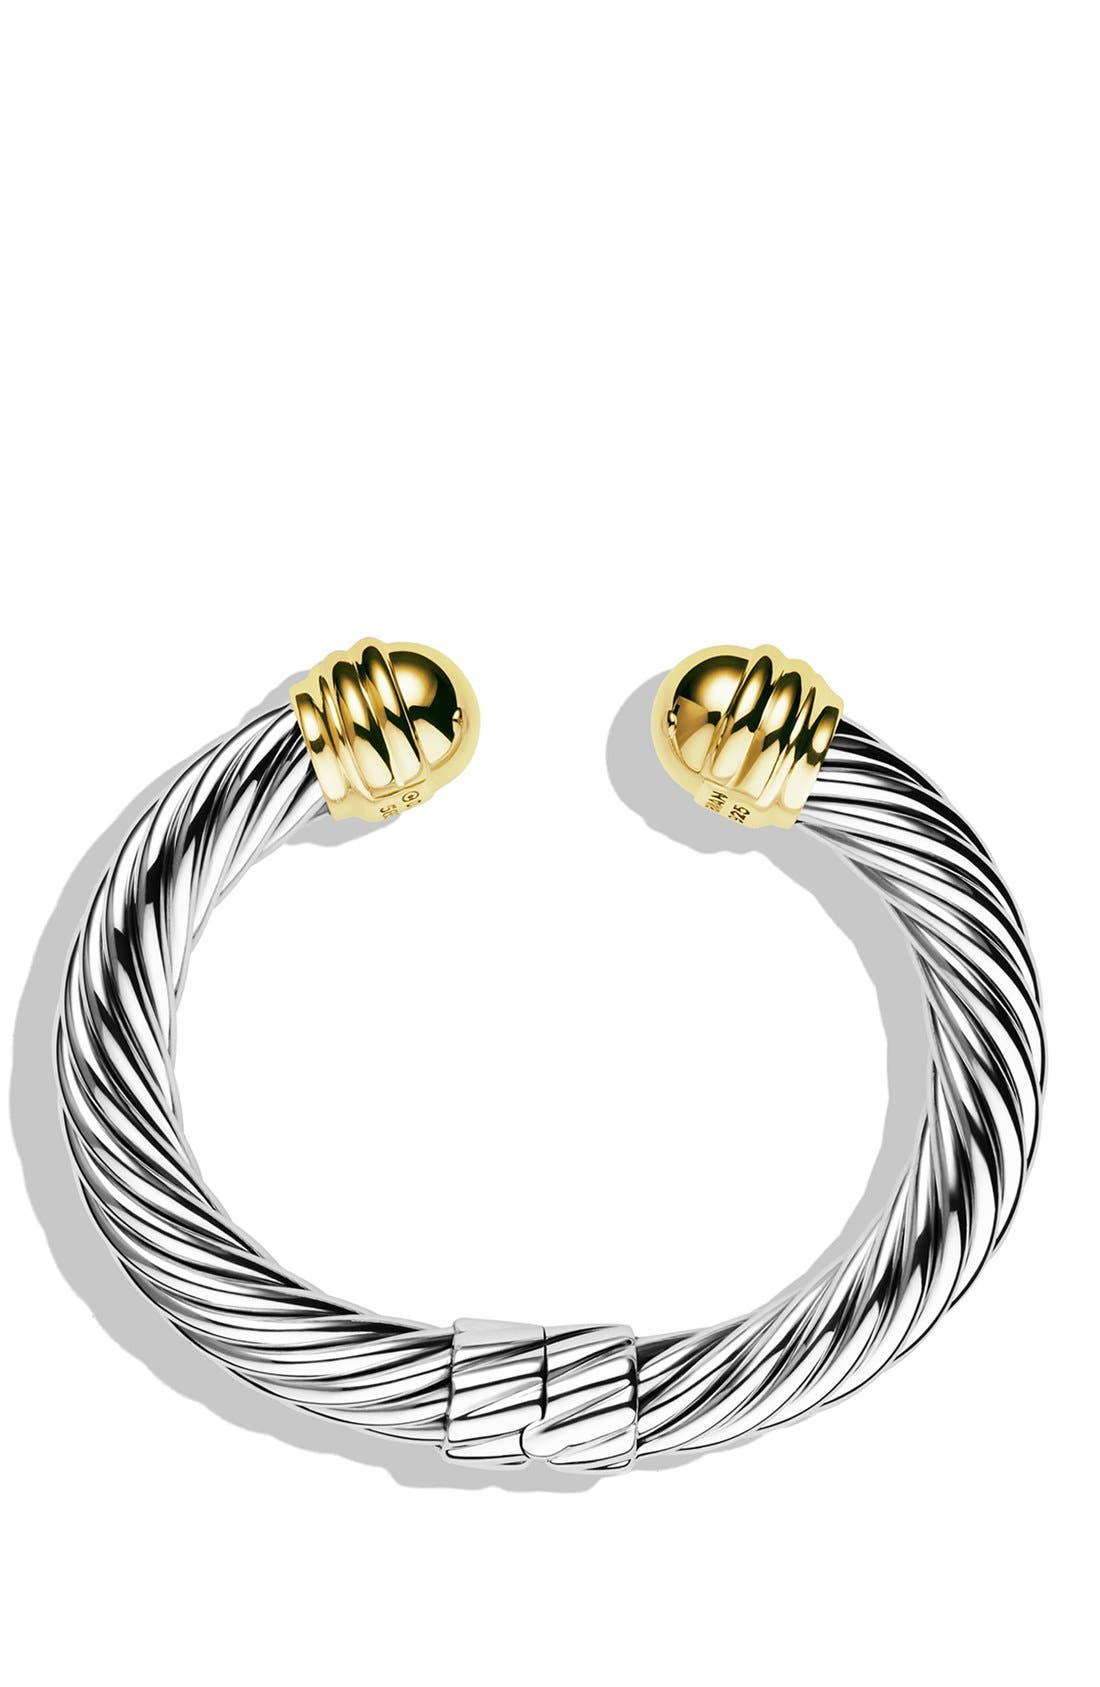 Alternate Image 2  - David Yurman 'Cable Classics' Bracelet with Gold Domes